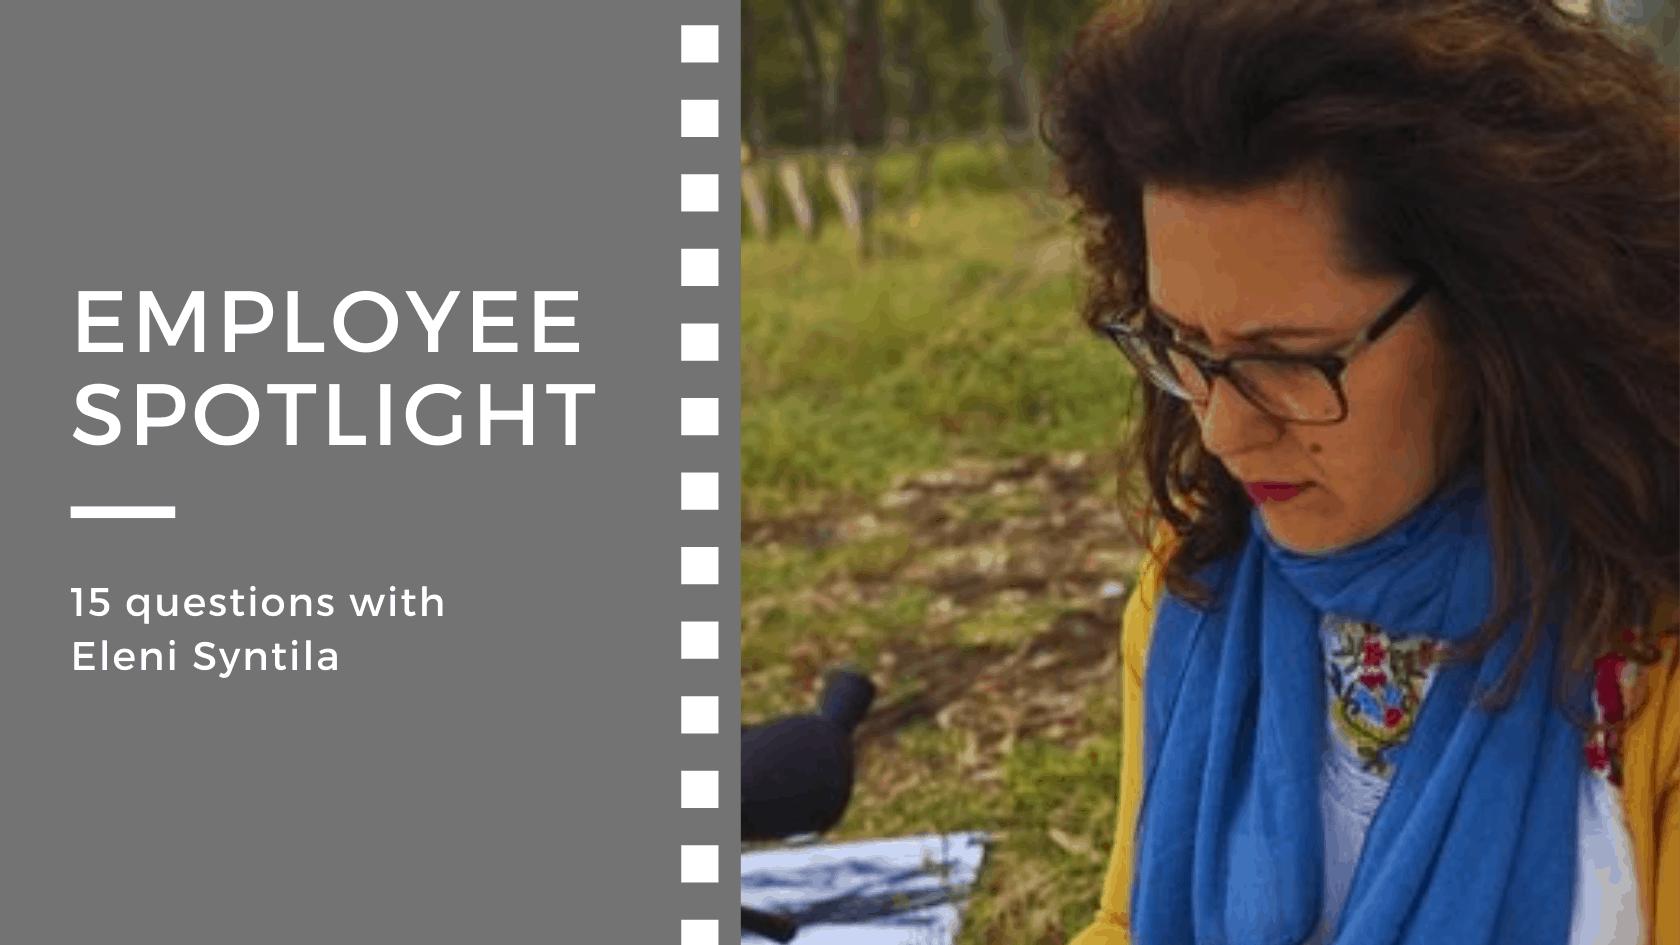 Employee spotlight:<br>15 questions with Eleni Syntila